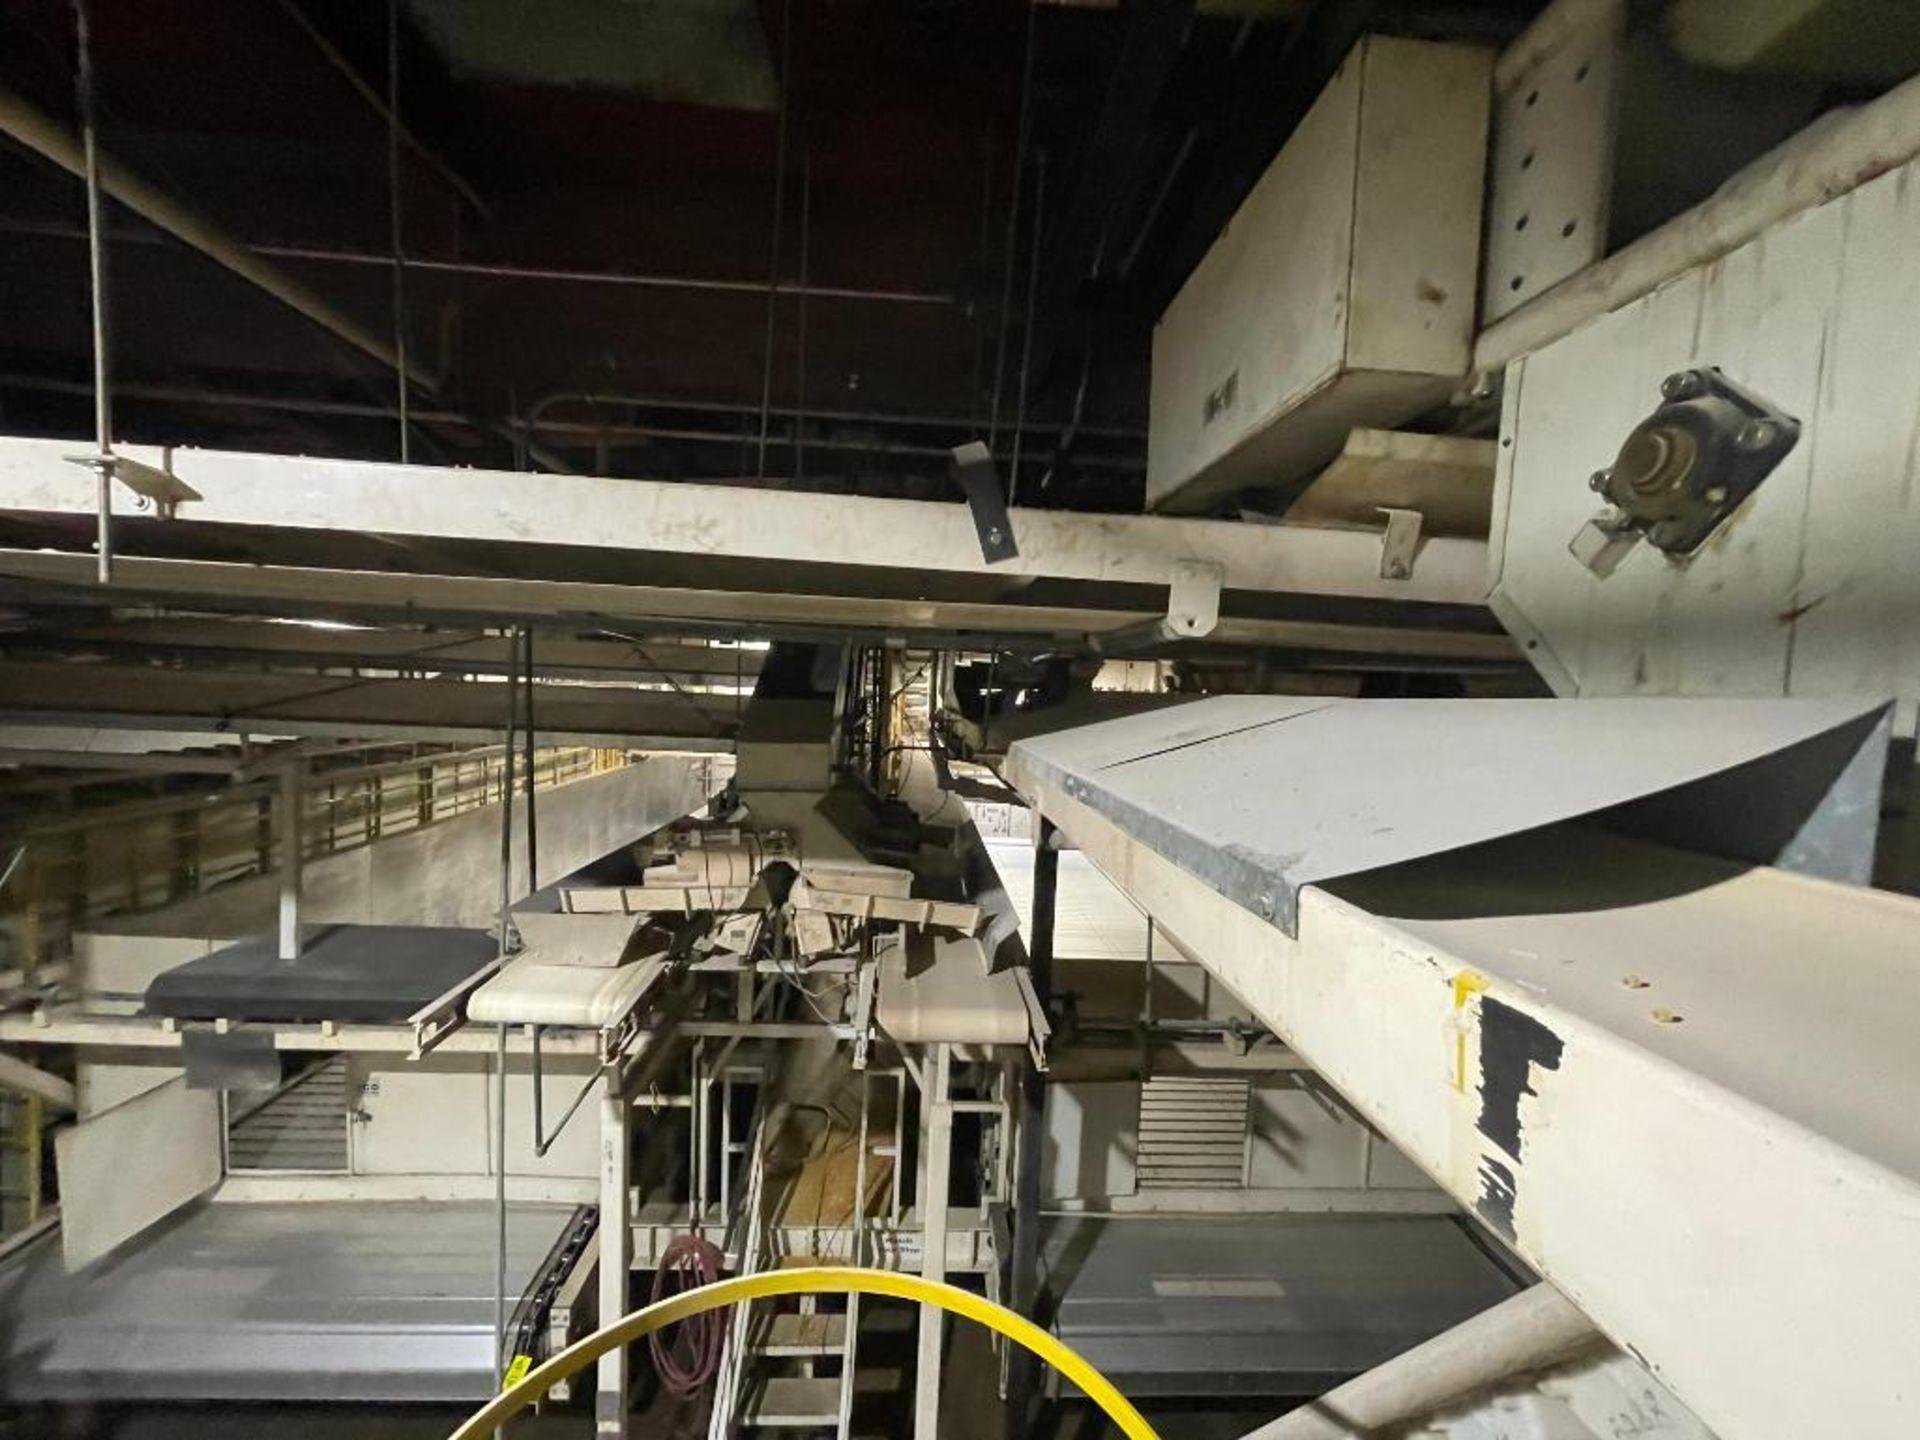 2 Aseeco horizontal overhead mild steel belt conveyors - Image 9 of 9